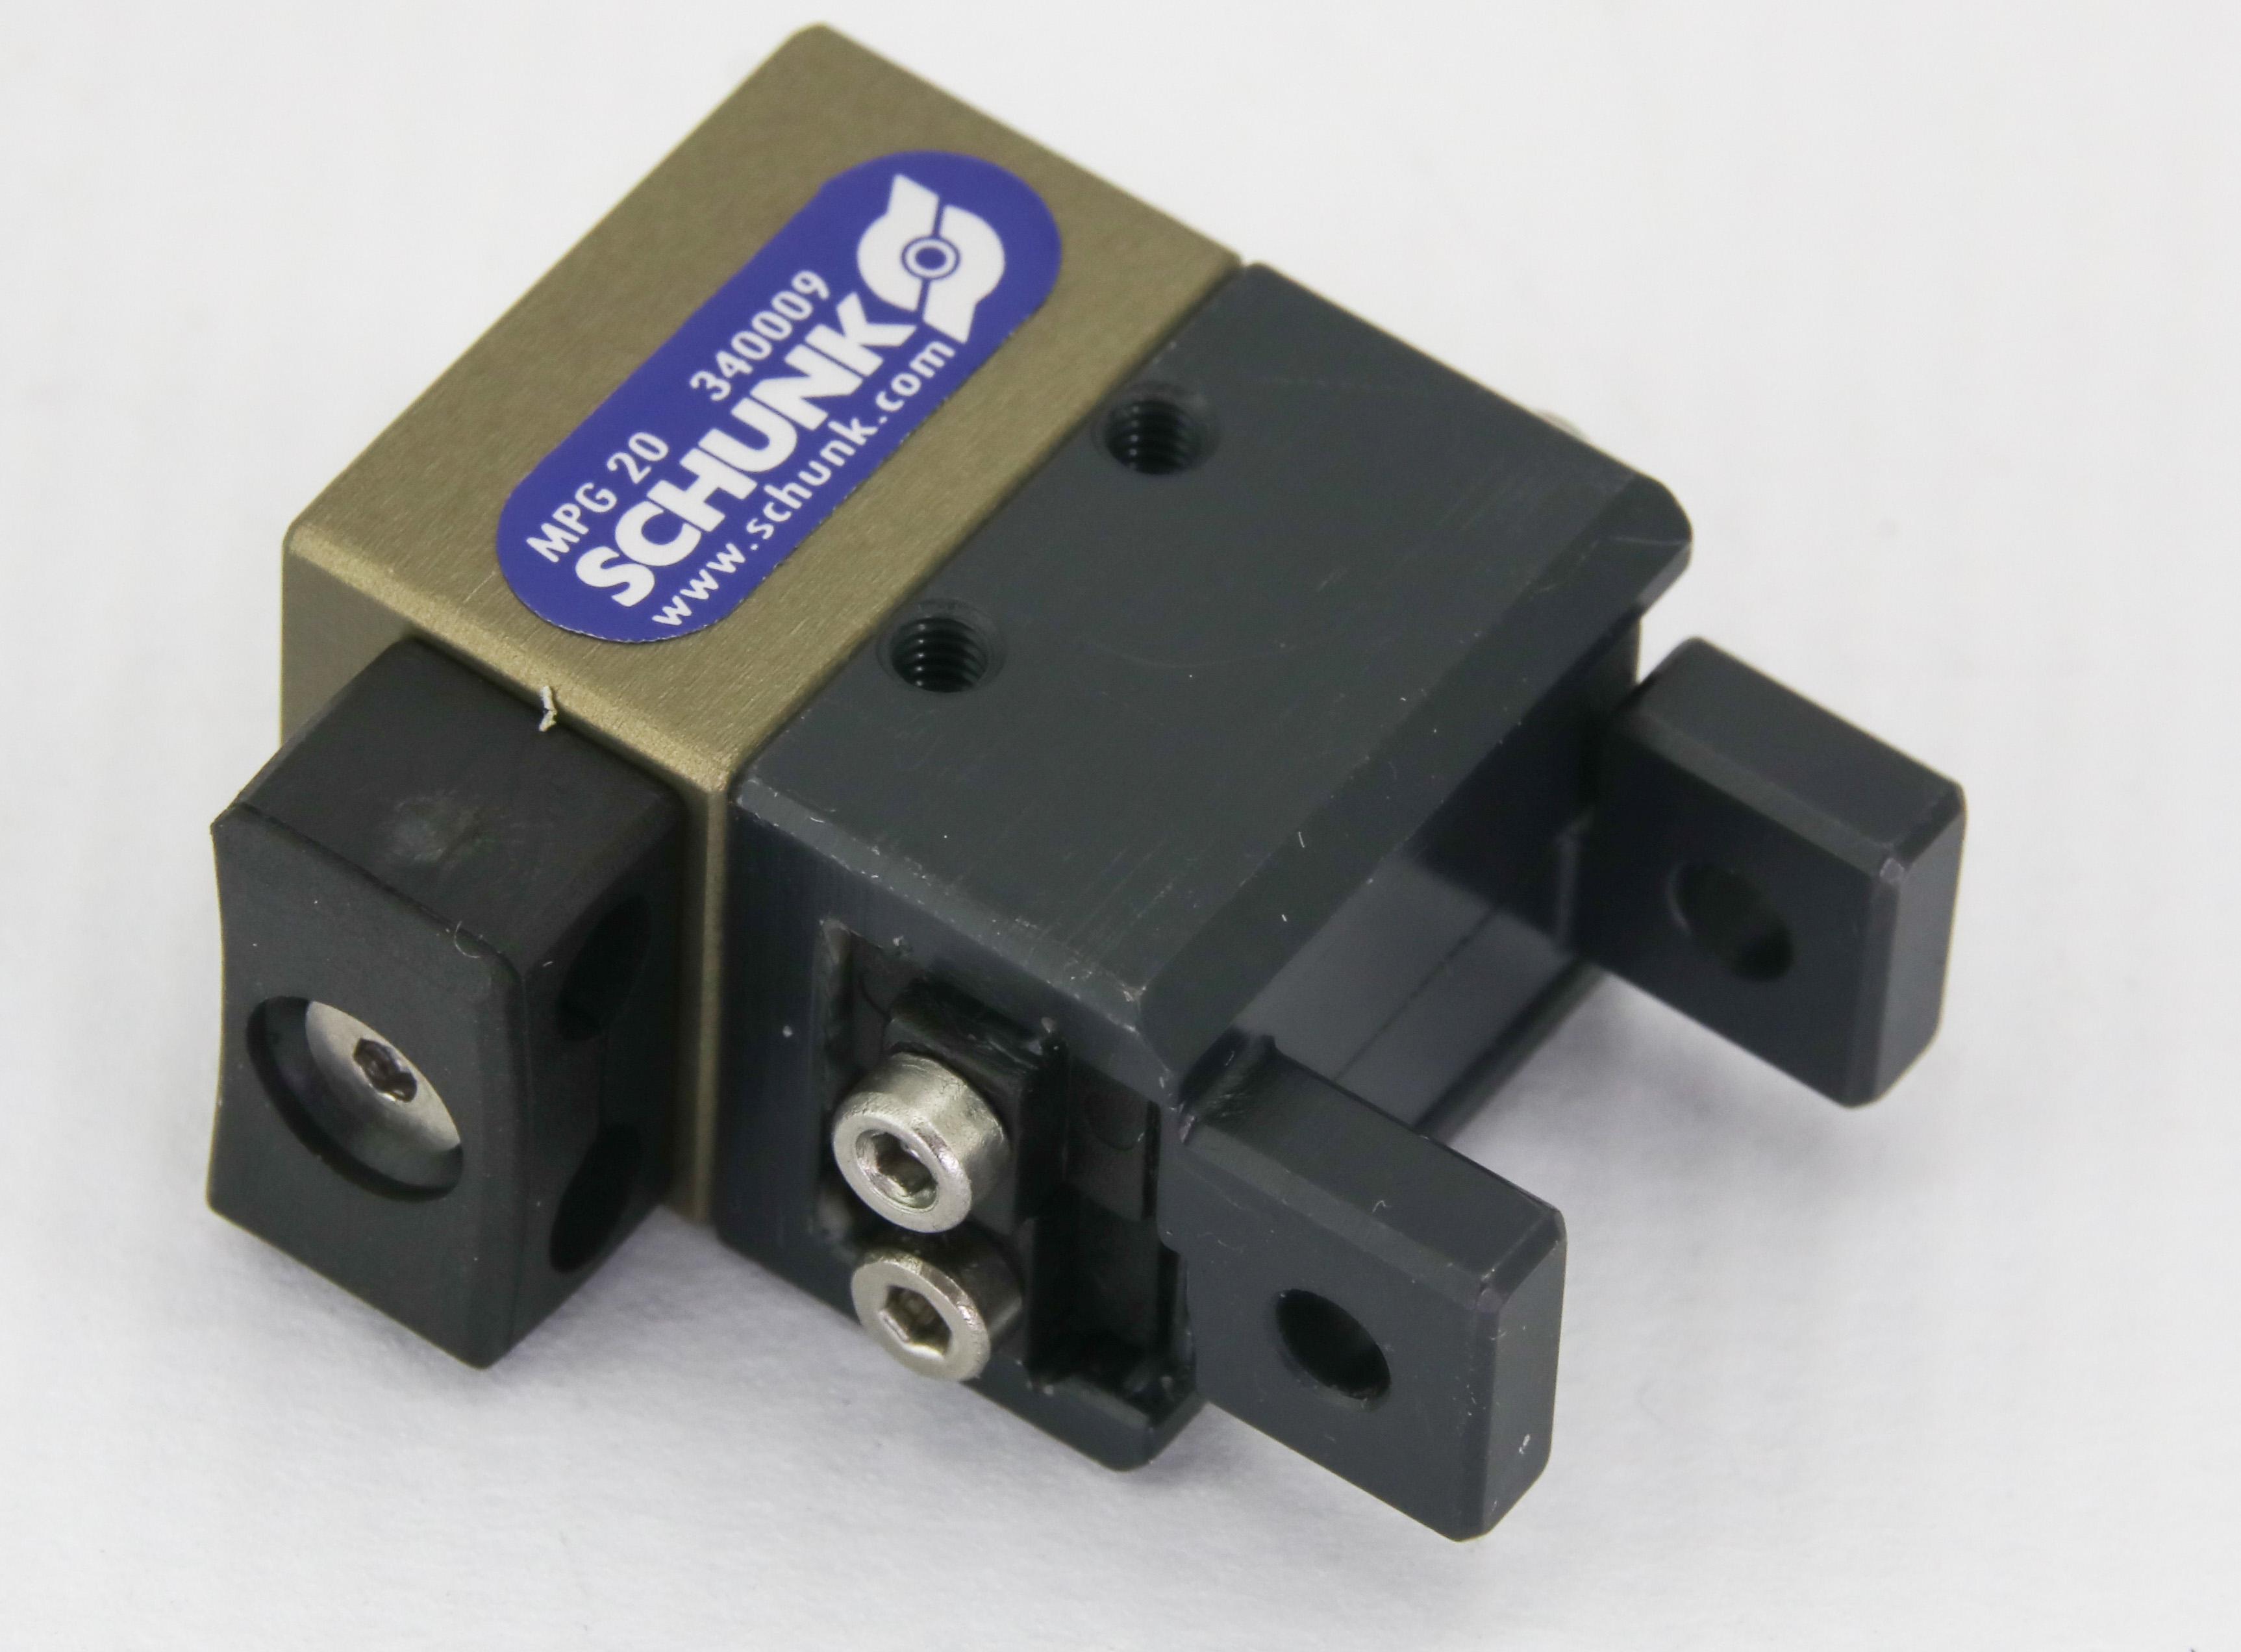 Schunk  MPG 20 0340009  MPG 2-Finger Parallel Gripper